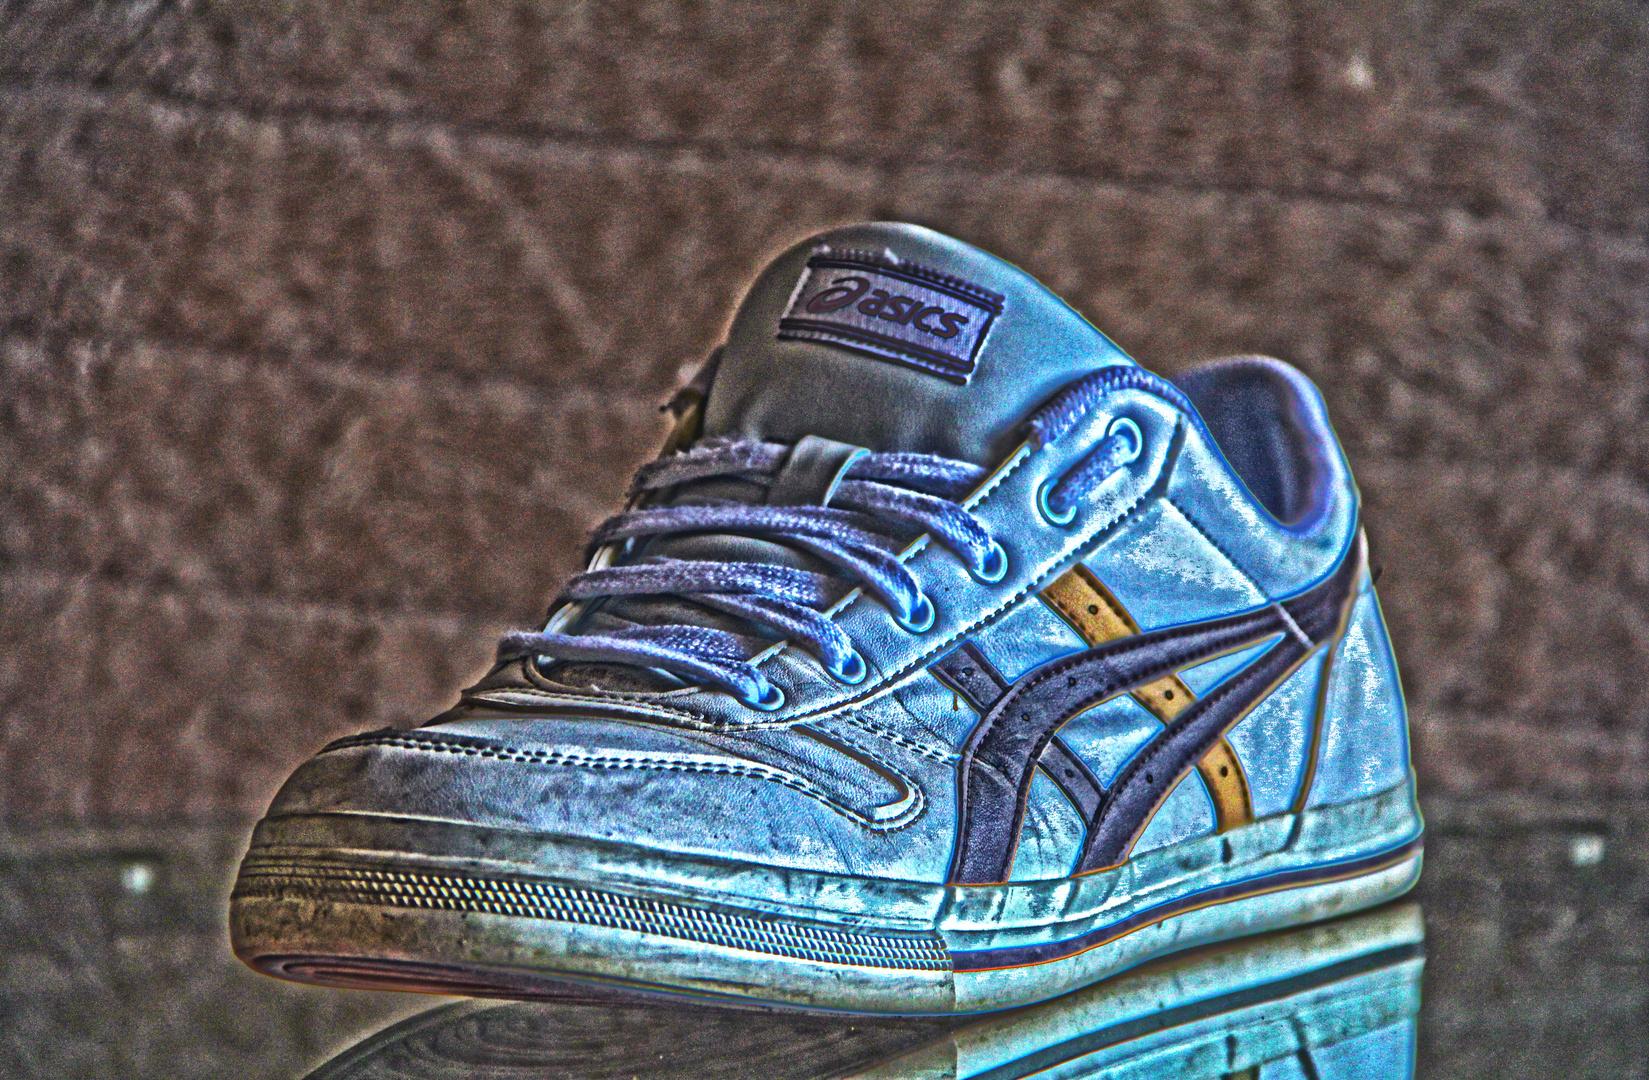 Schuh...